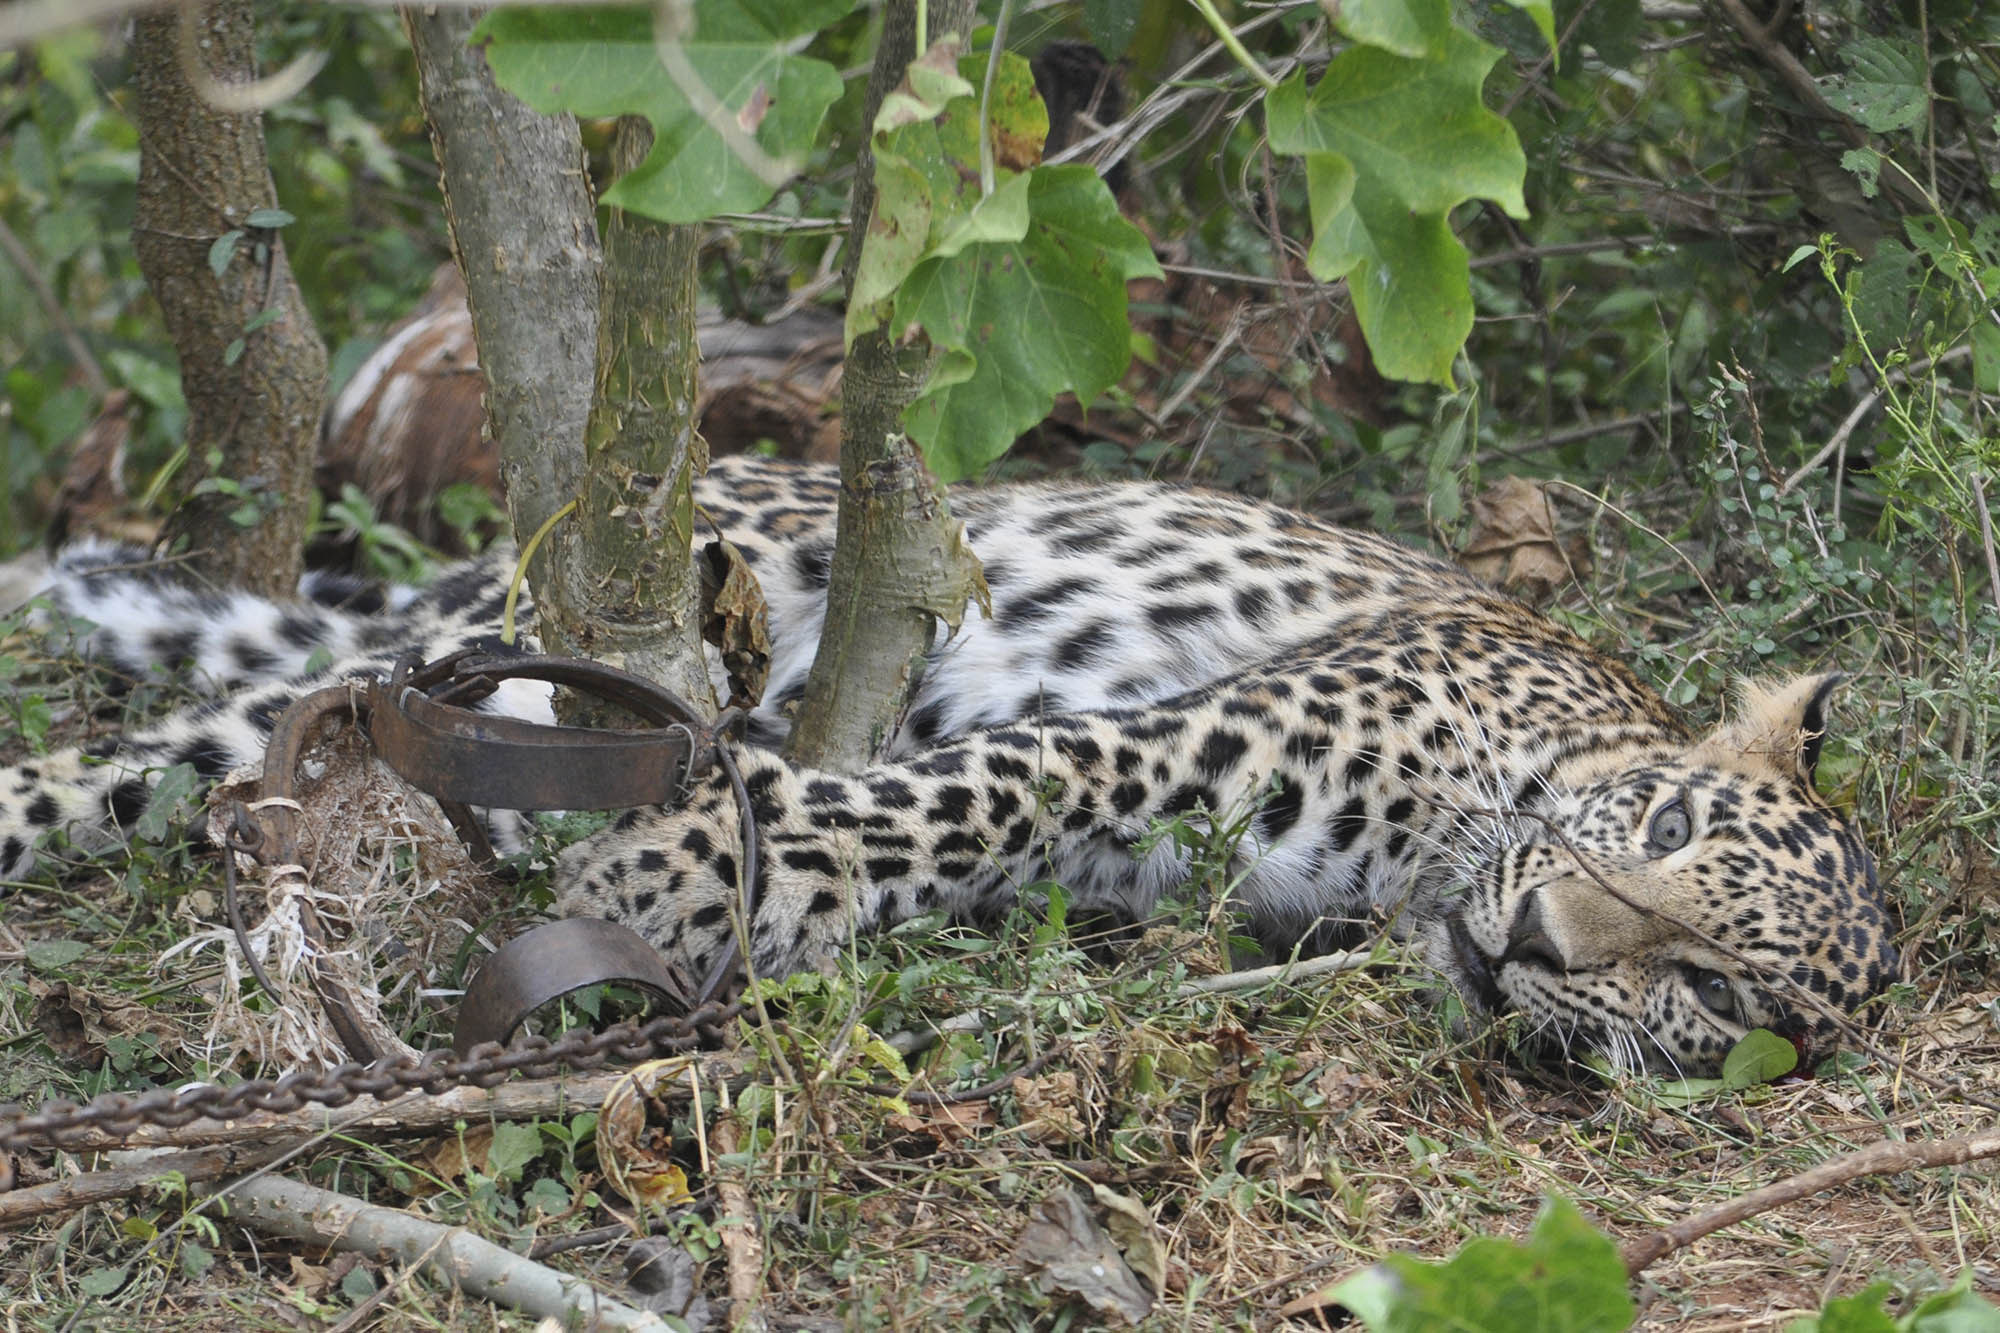 Coronavirus lockdowns enhance poaching in Asia, Africa